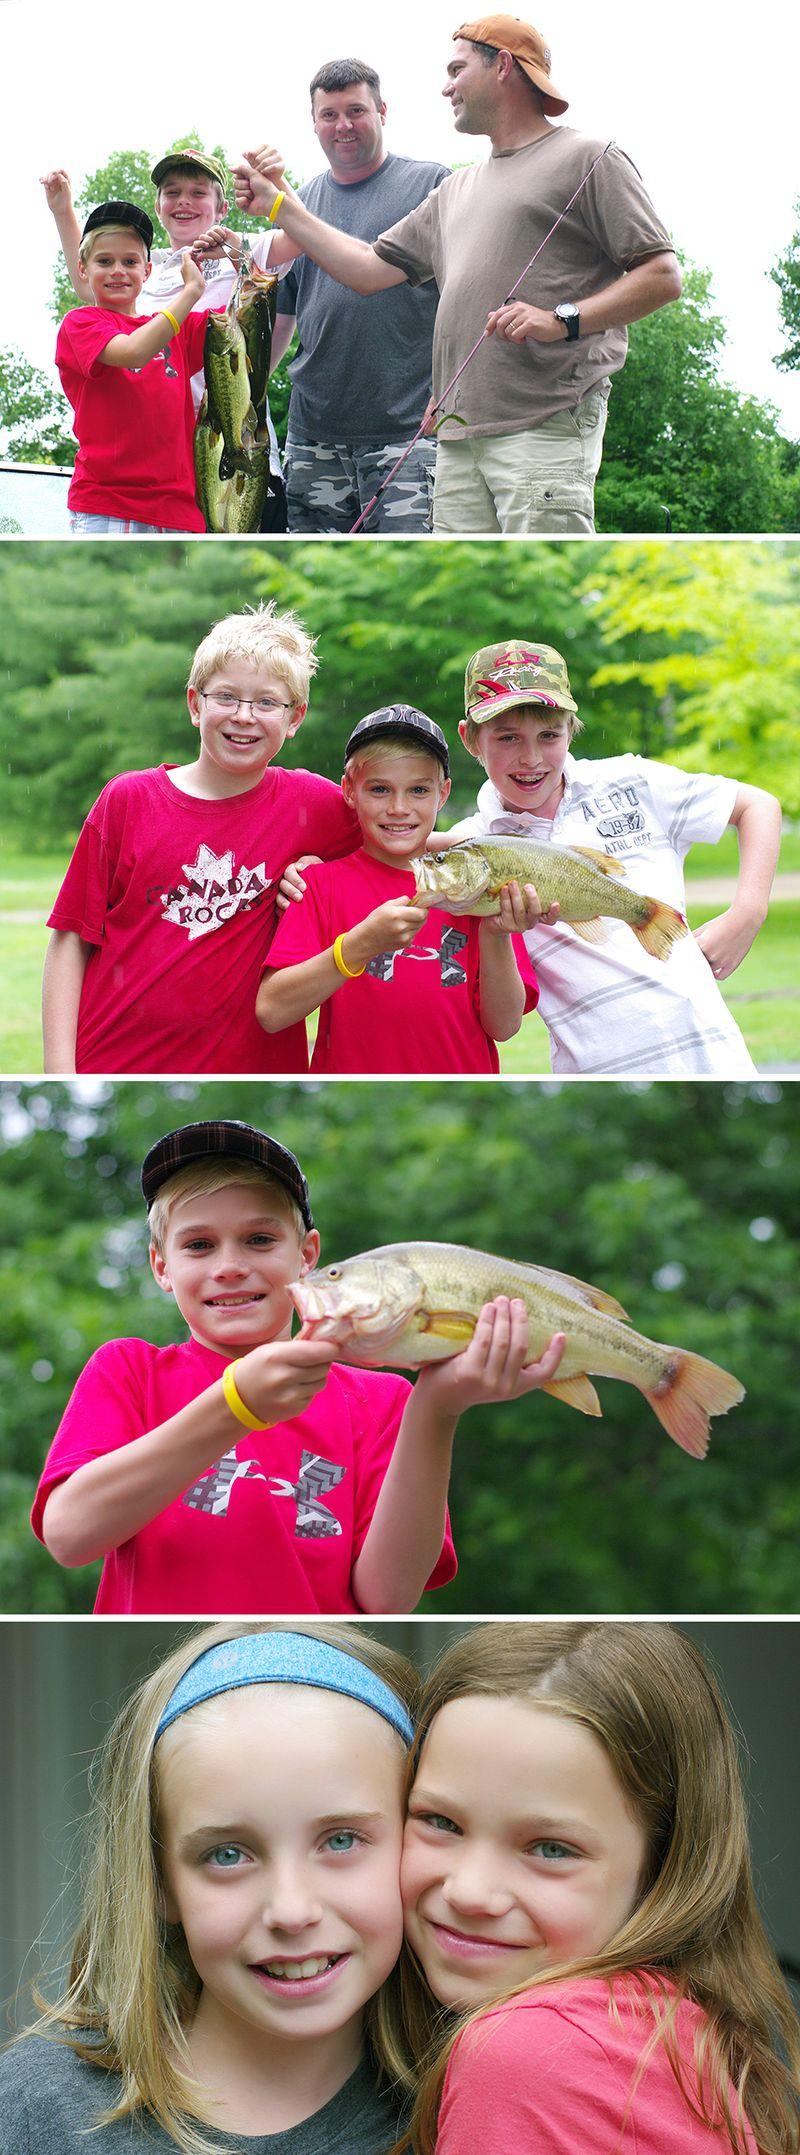 2fish